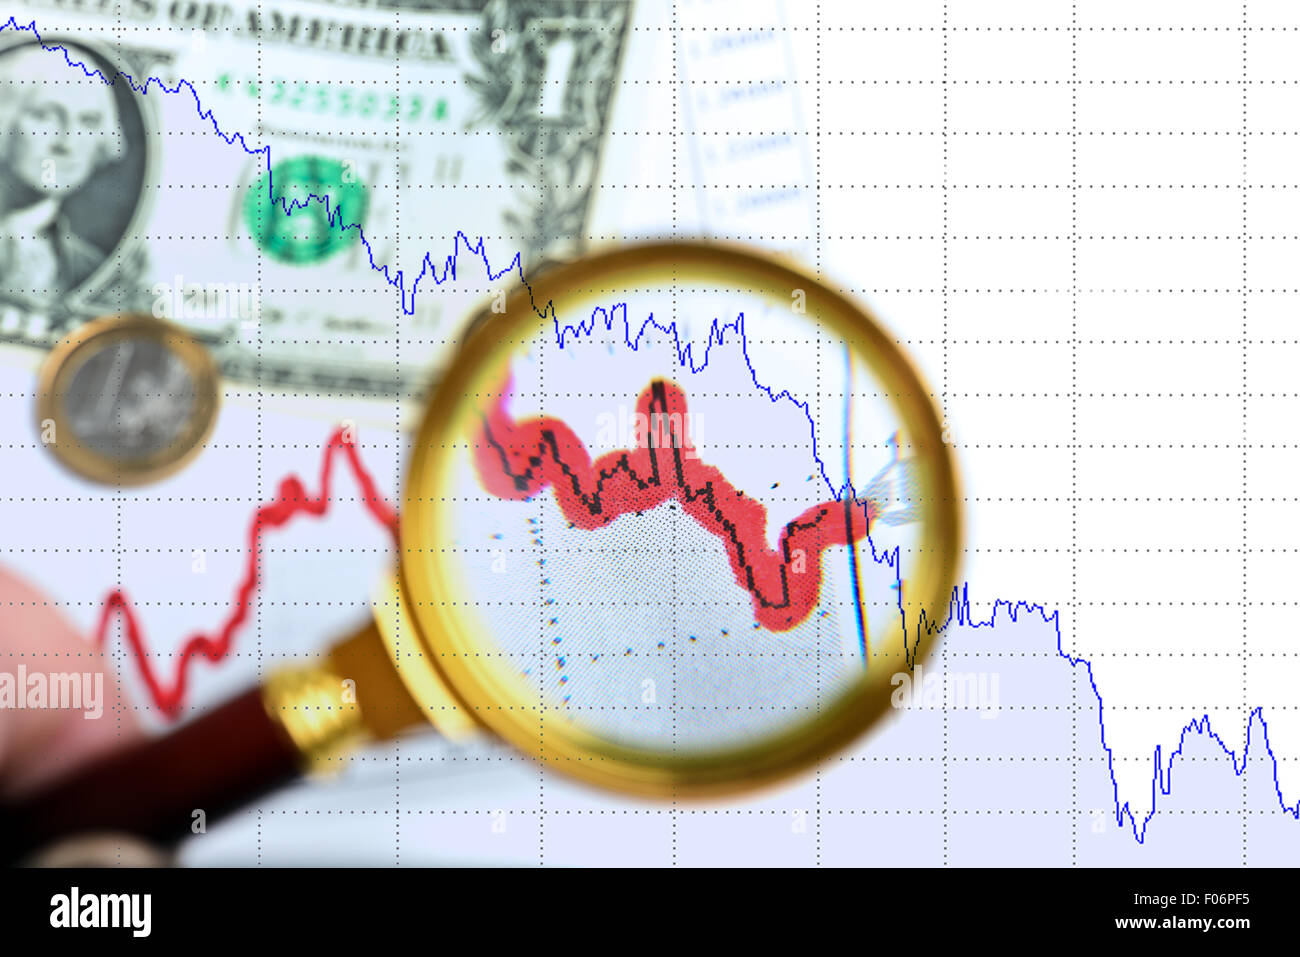 Magnifying glass on exchange chart - Stock Image